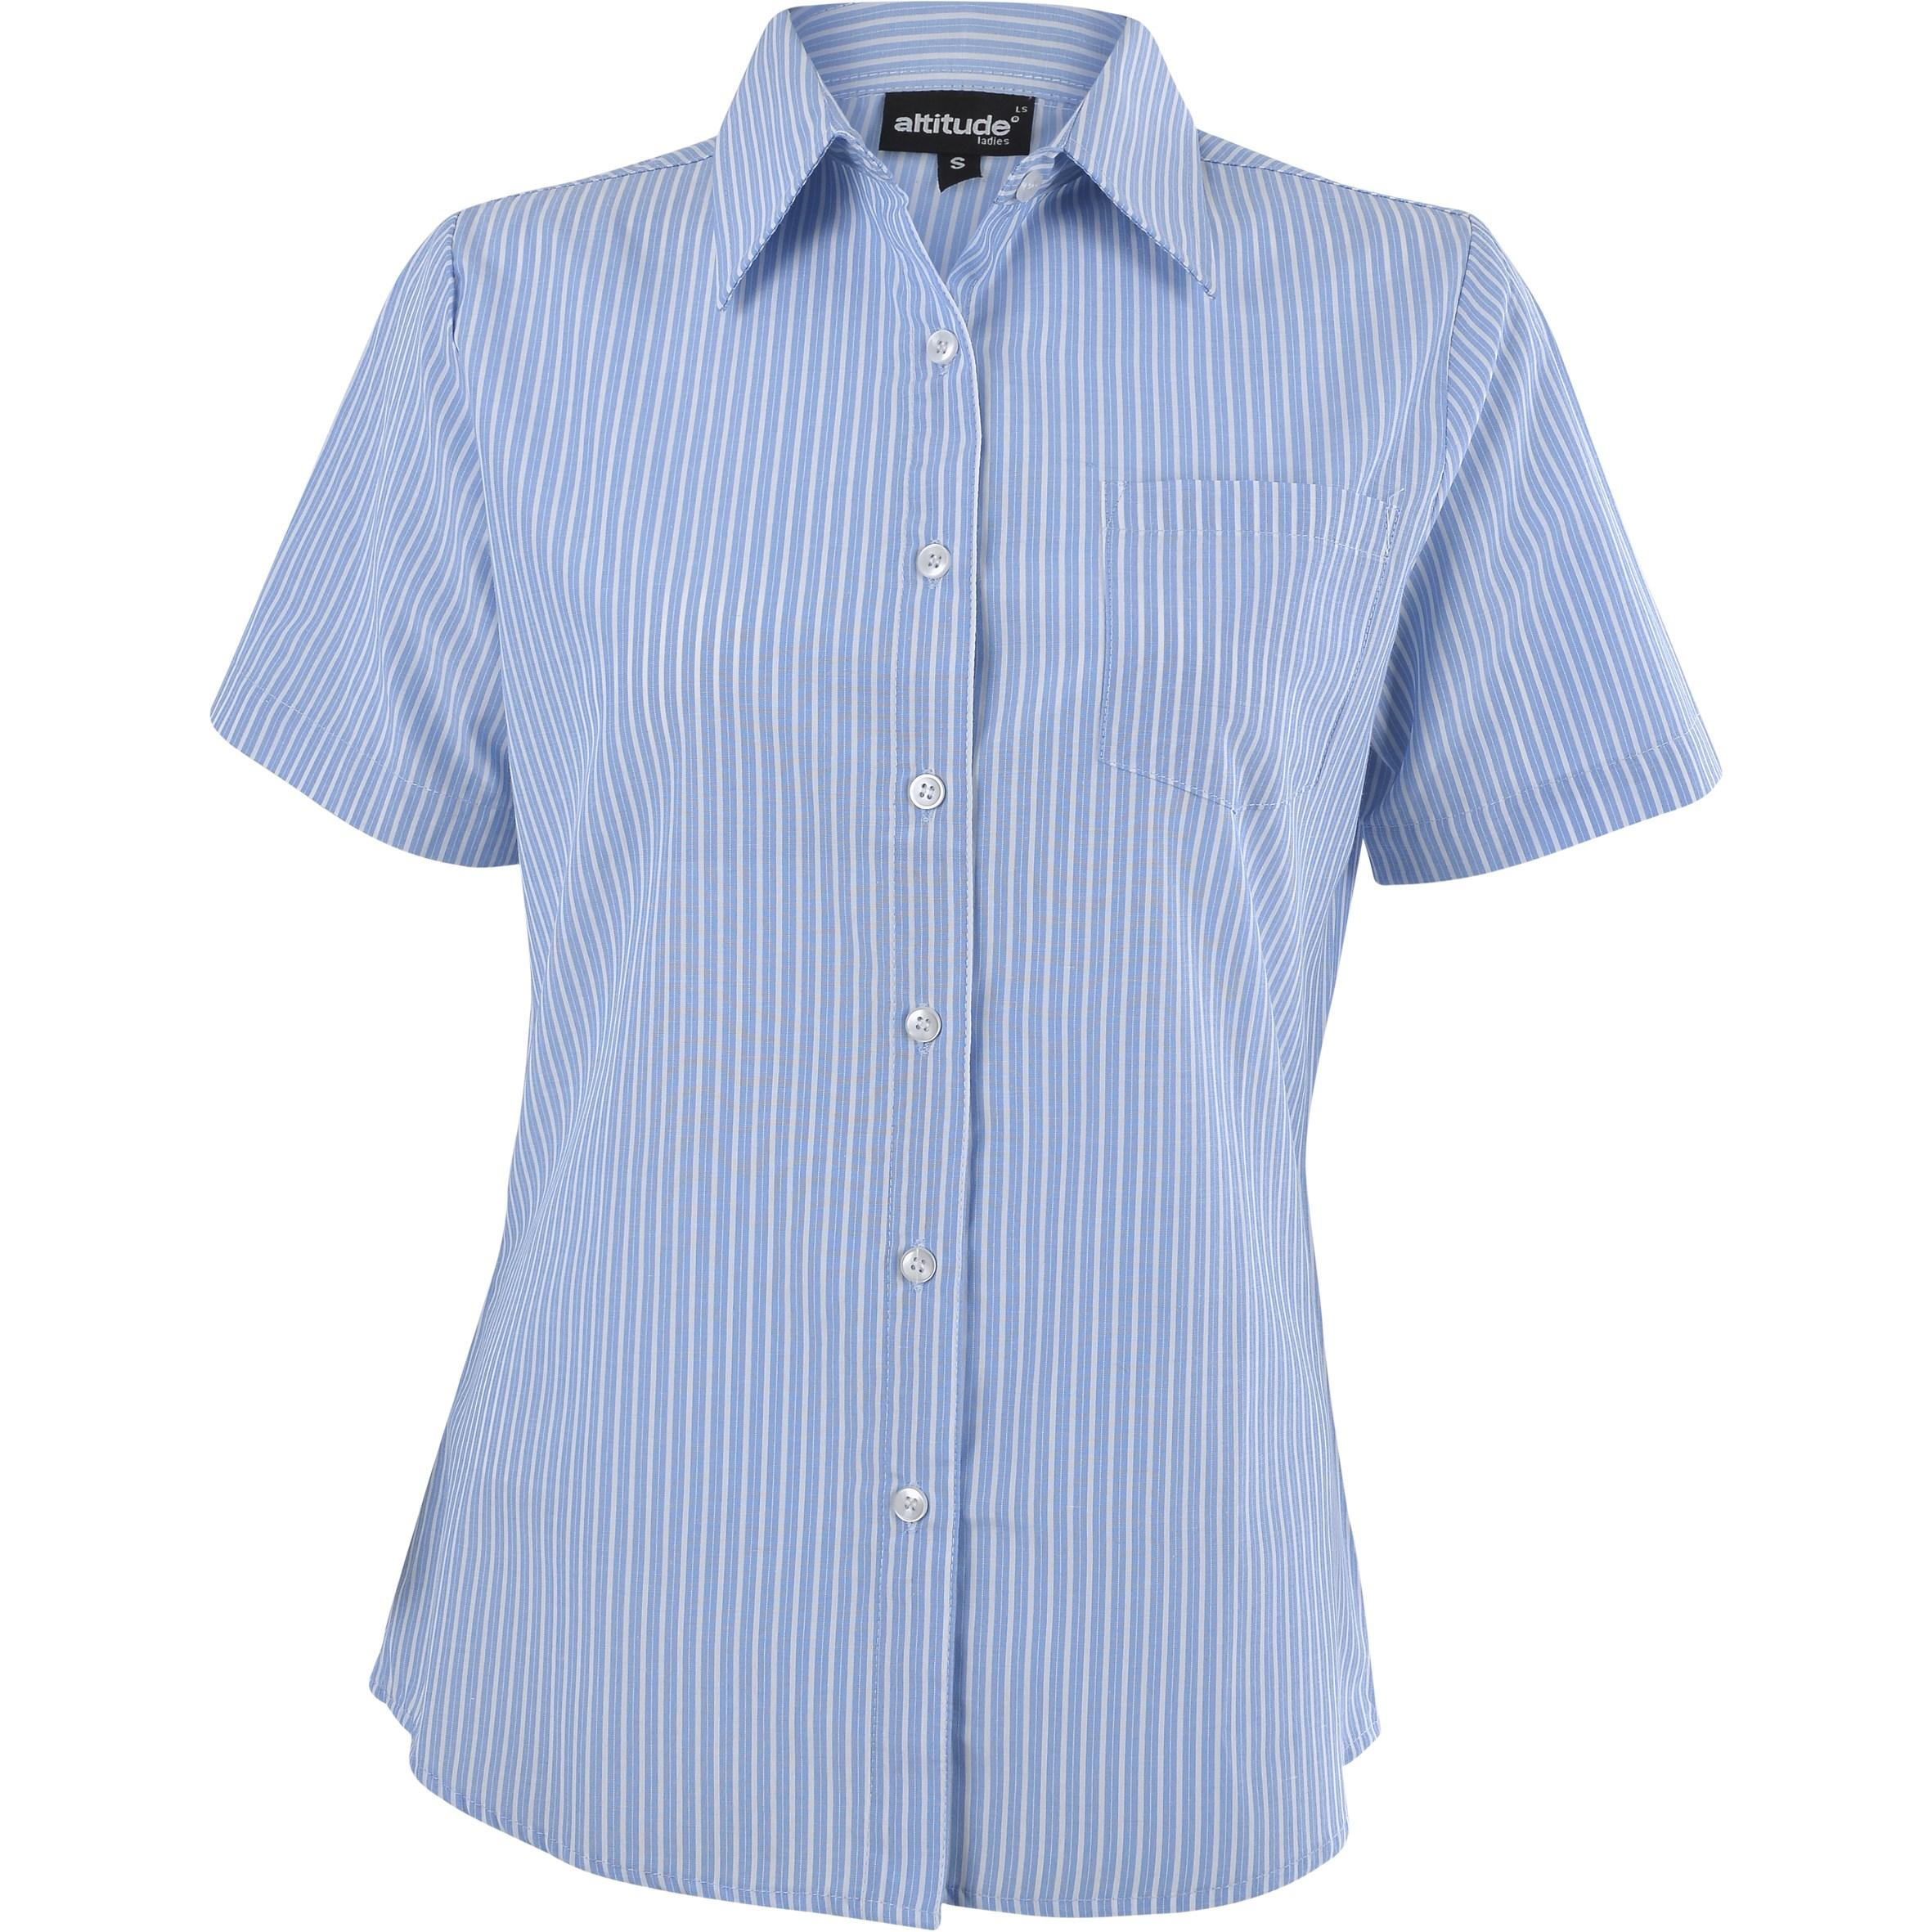 Ladies Short Sleeve Drew Shirt - Light Blue Only